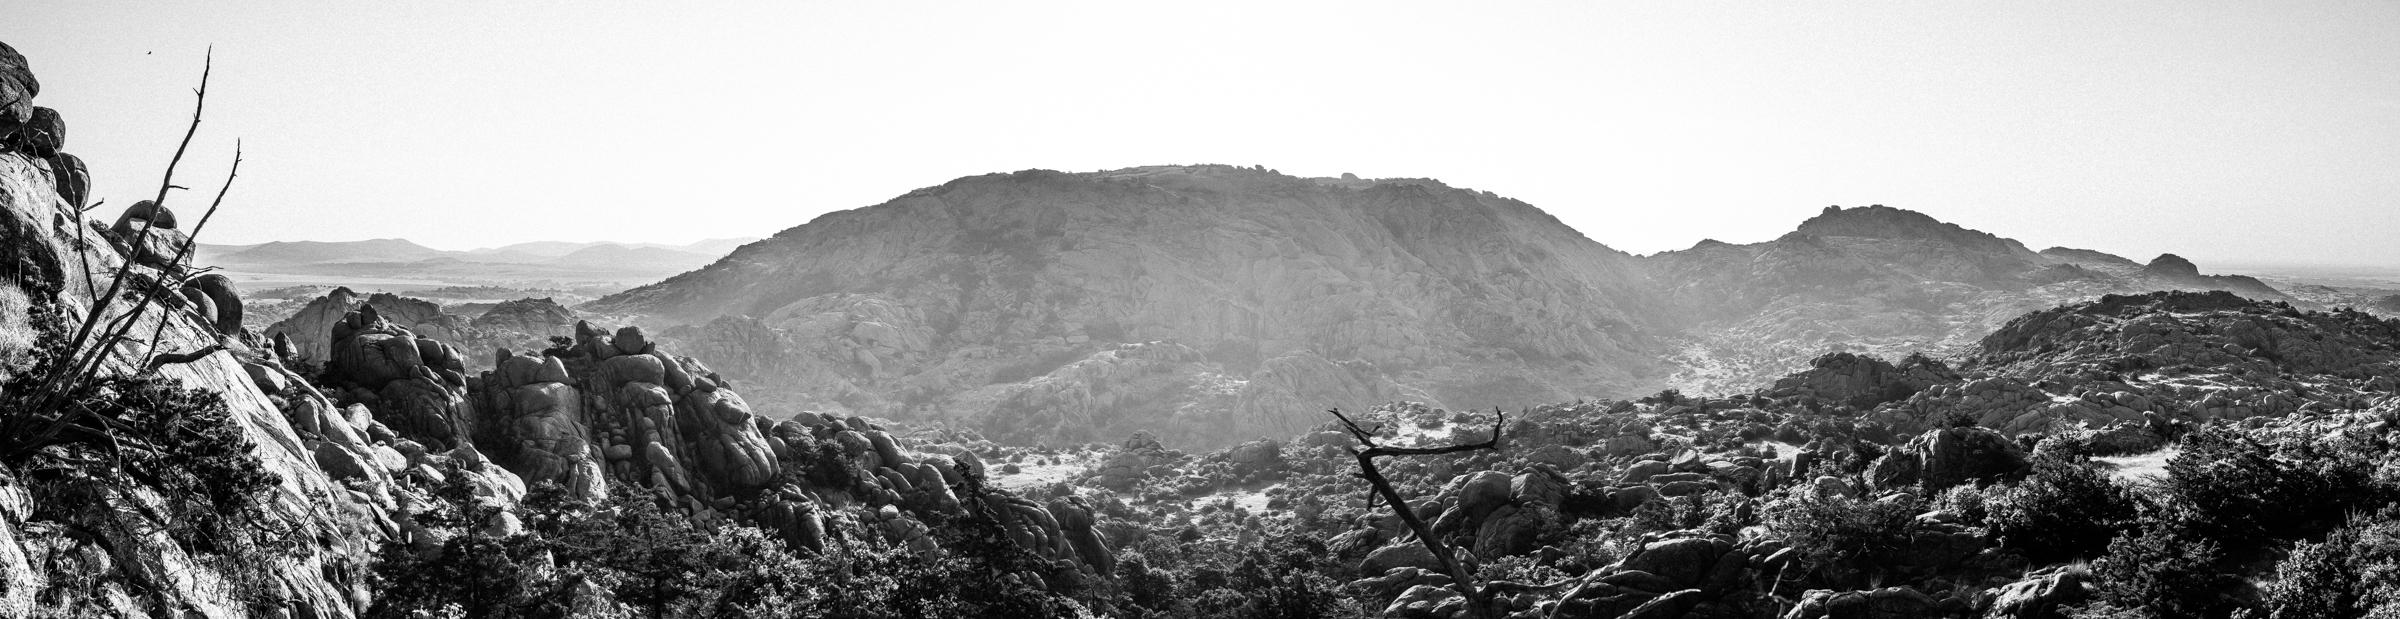 2017-08-05 Glass Mountain Peak B (9 of 20).jpg